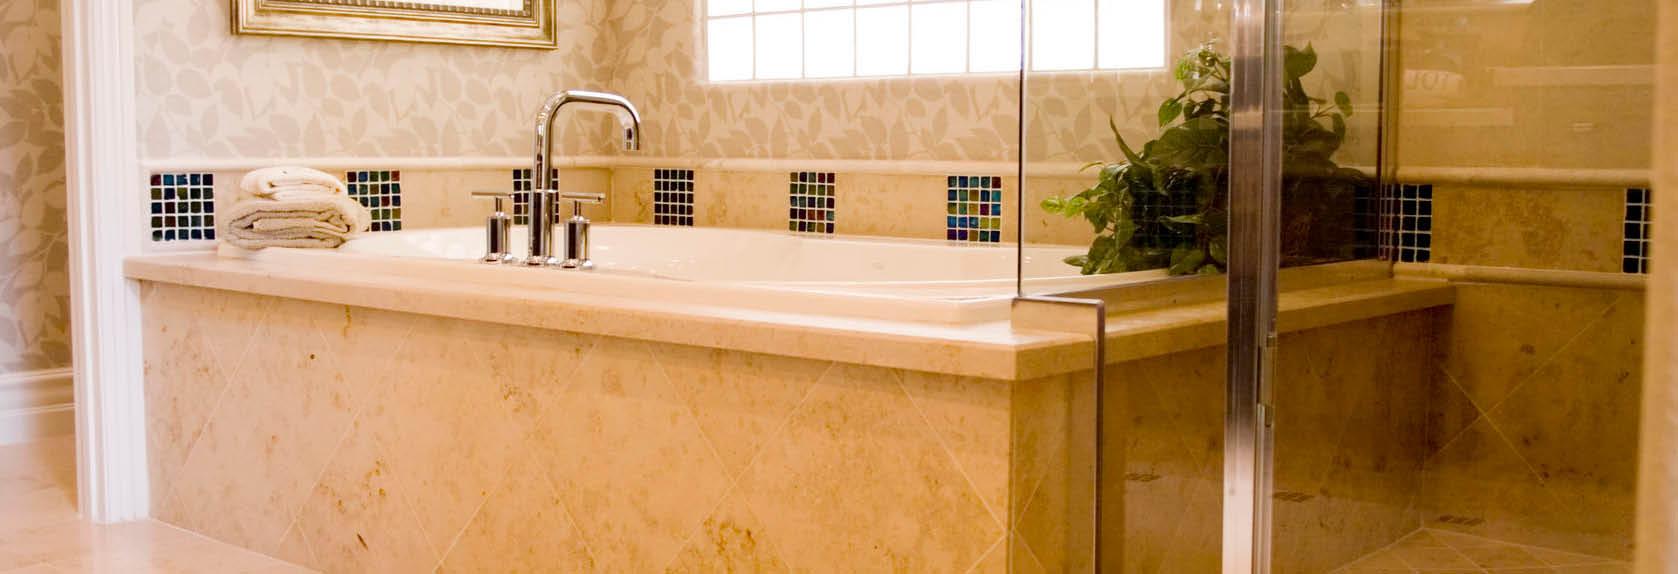 Finer Finish Tub & Tile Resurfacing tub photo